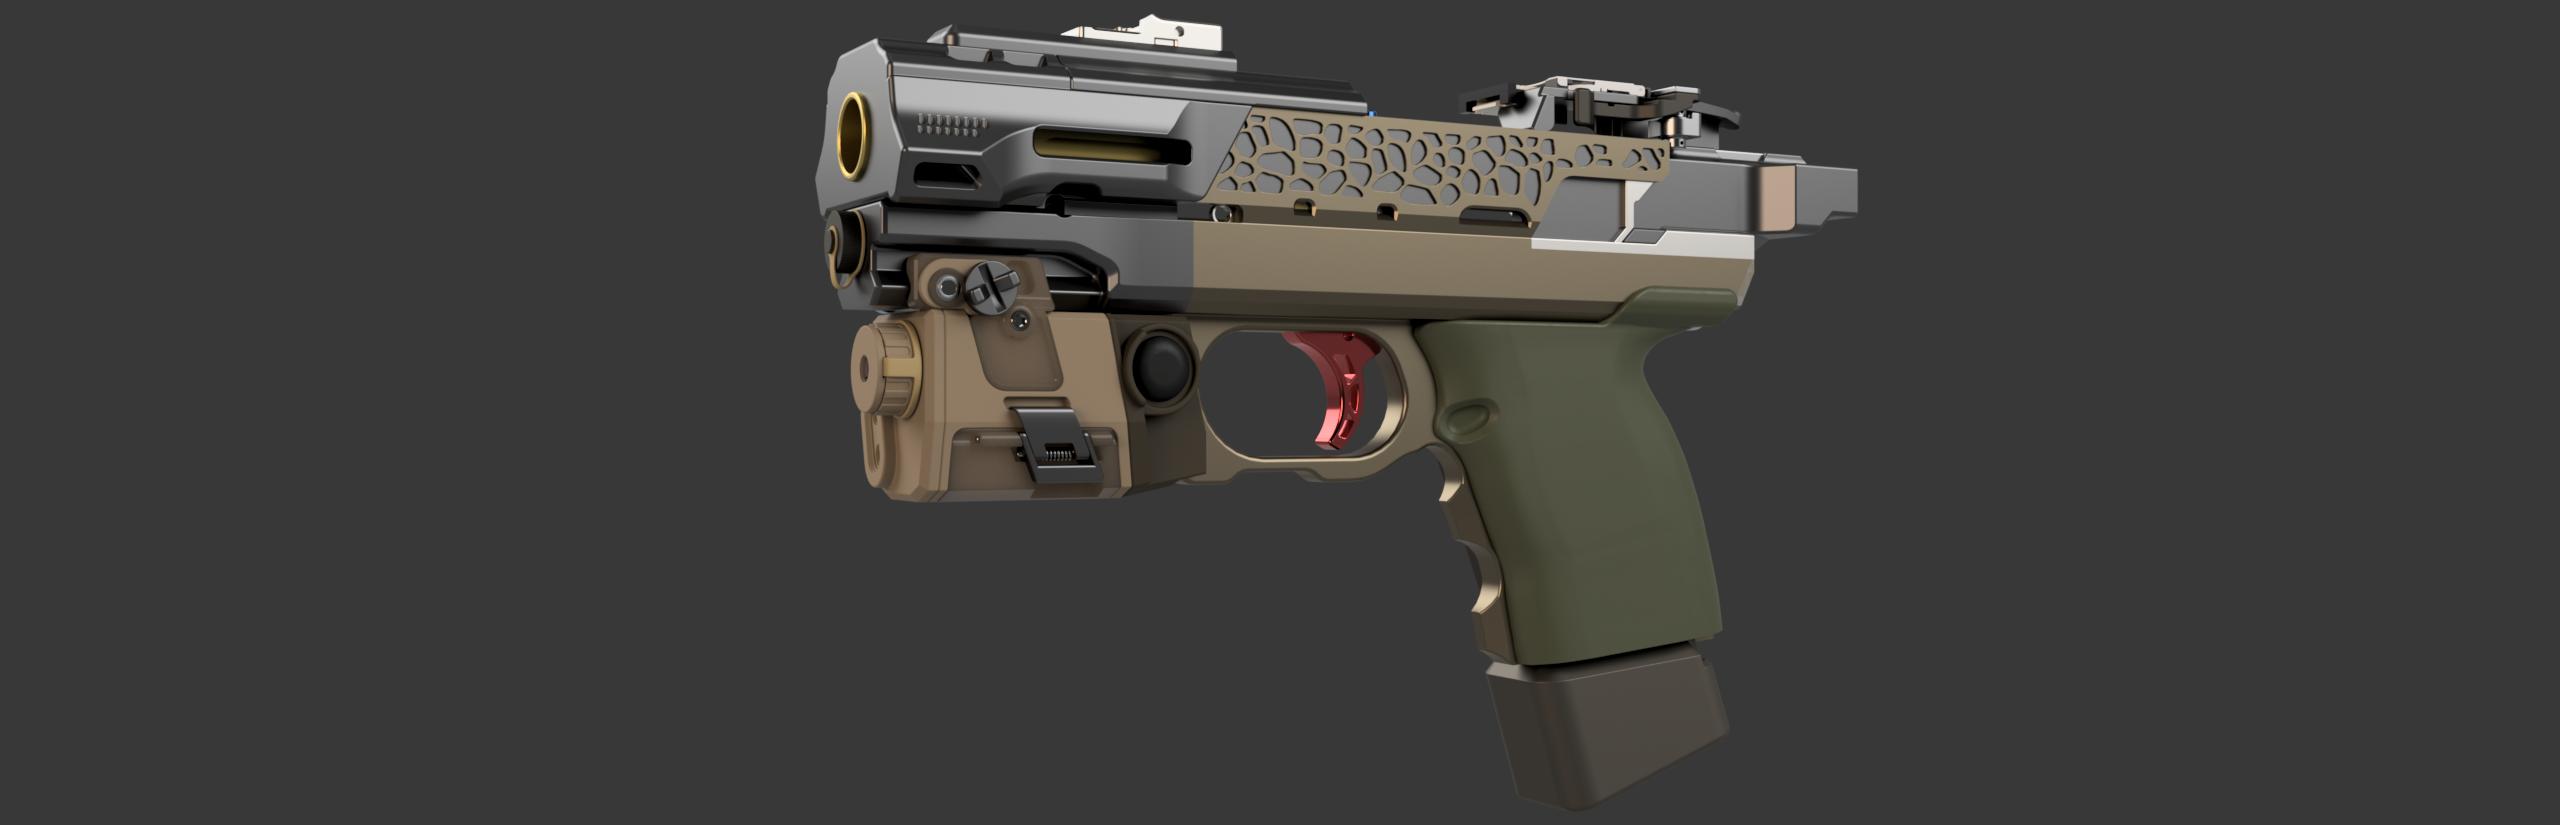 3D Weapon Challenge - 03/31/2019